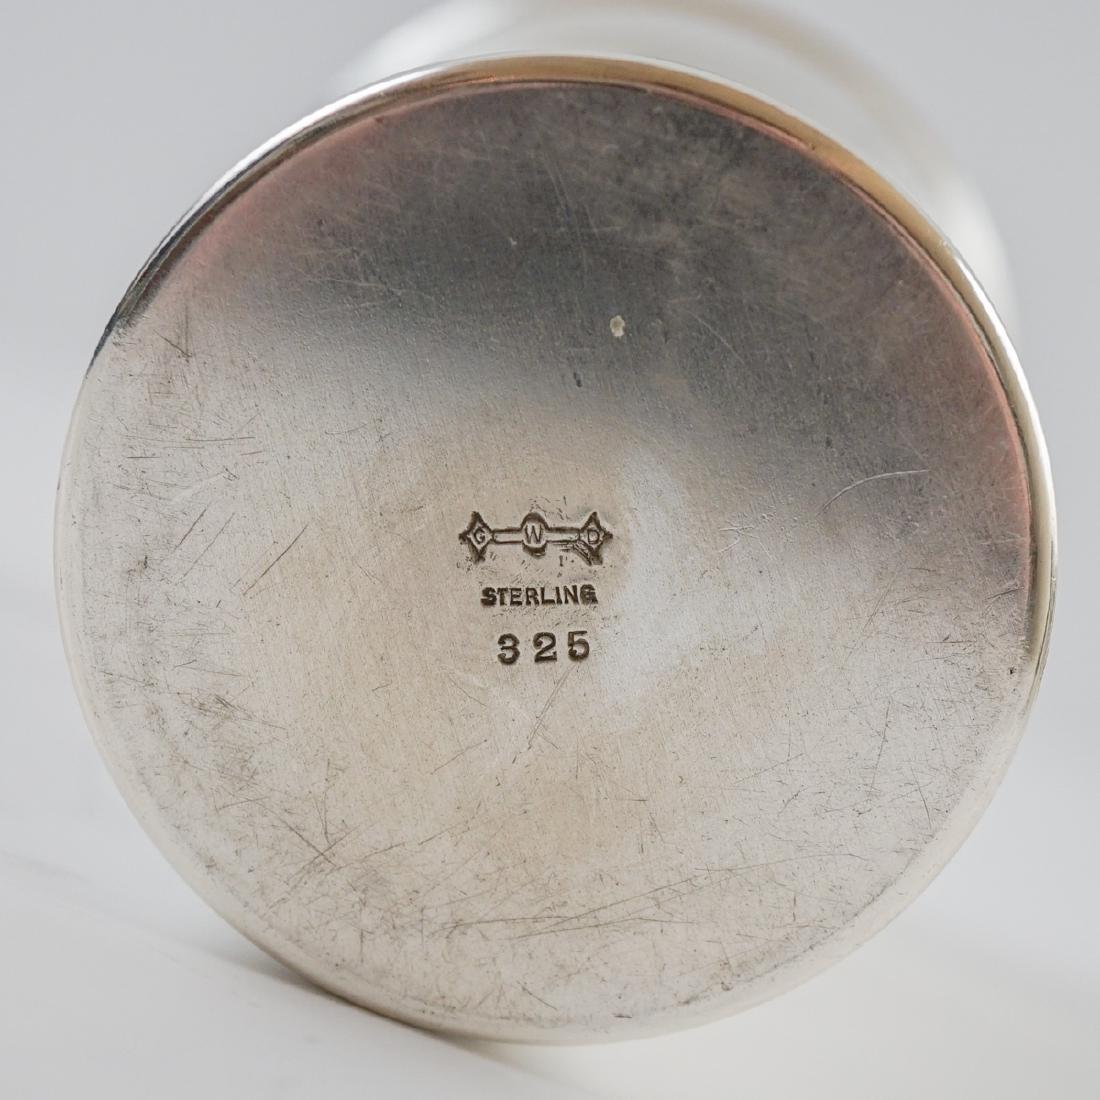 Graff, Washbourne & Dunn Sterling Tumblers - 5